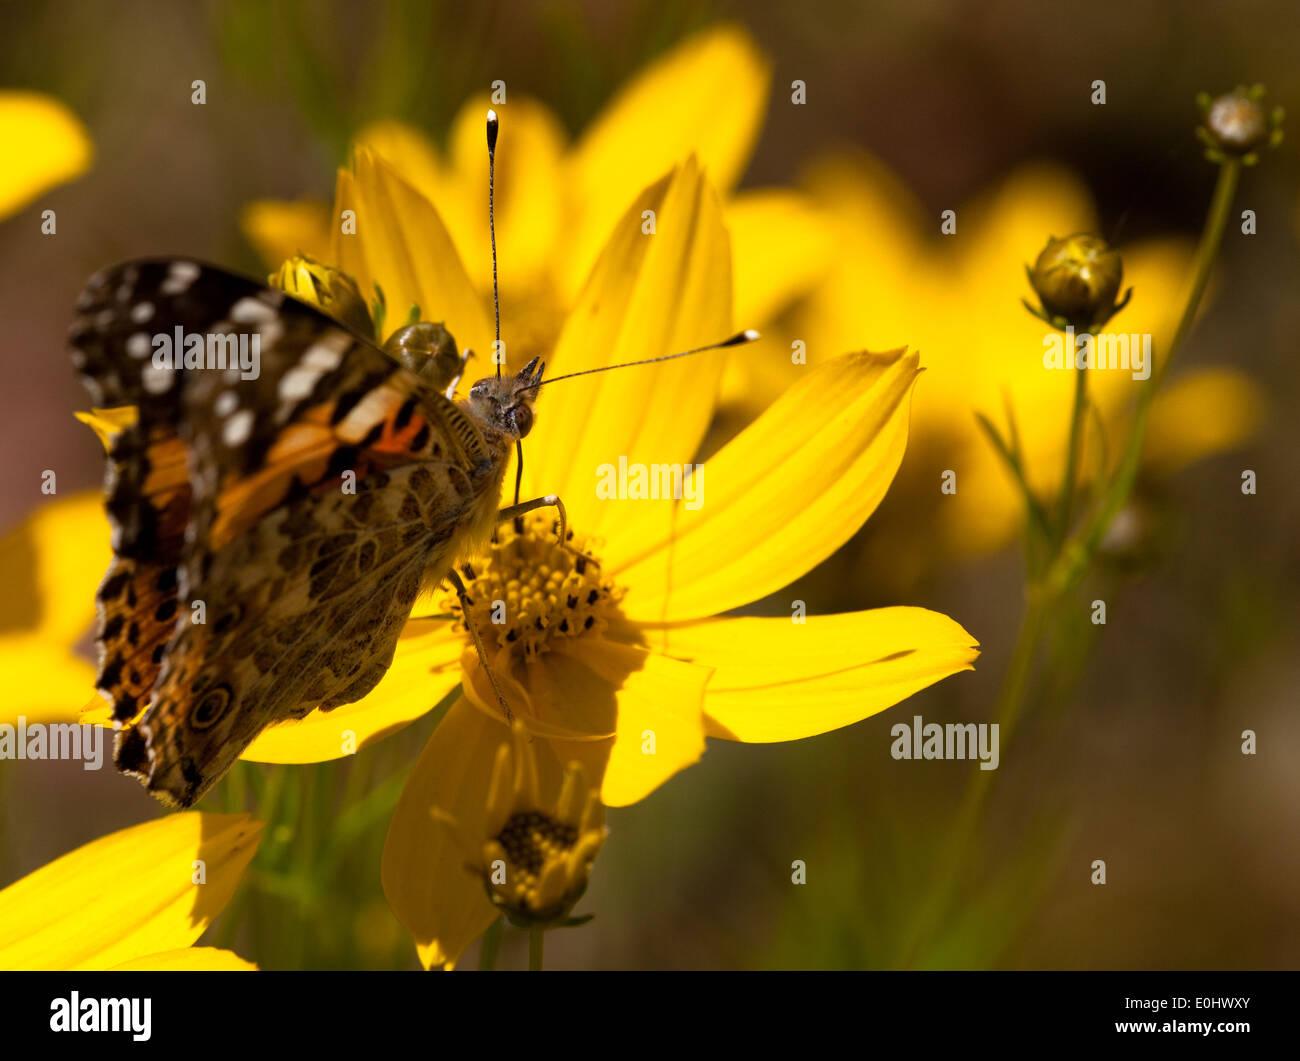 Distelfalter, Topinambur (Helianthus tuberosus), DIE GARTEN TULLN 2009 - Painted Lady, Jerusalem artichoke Stock Photo